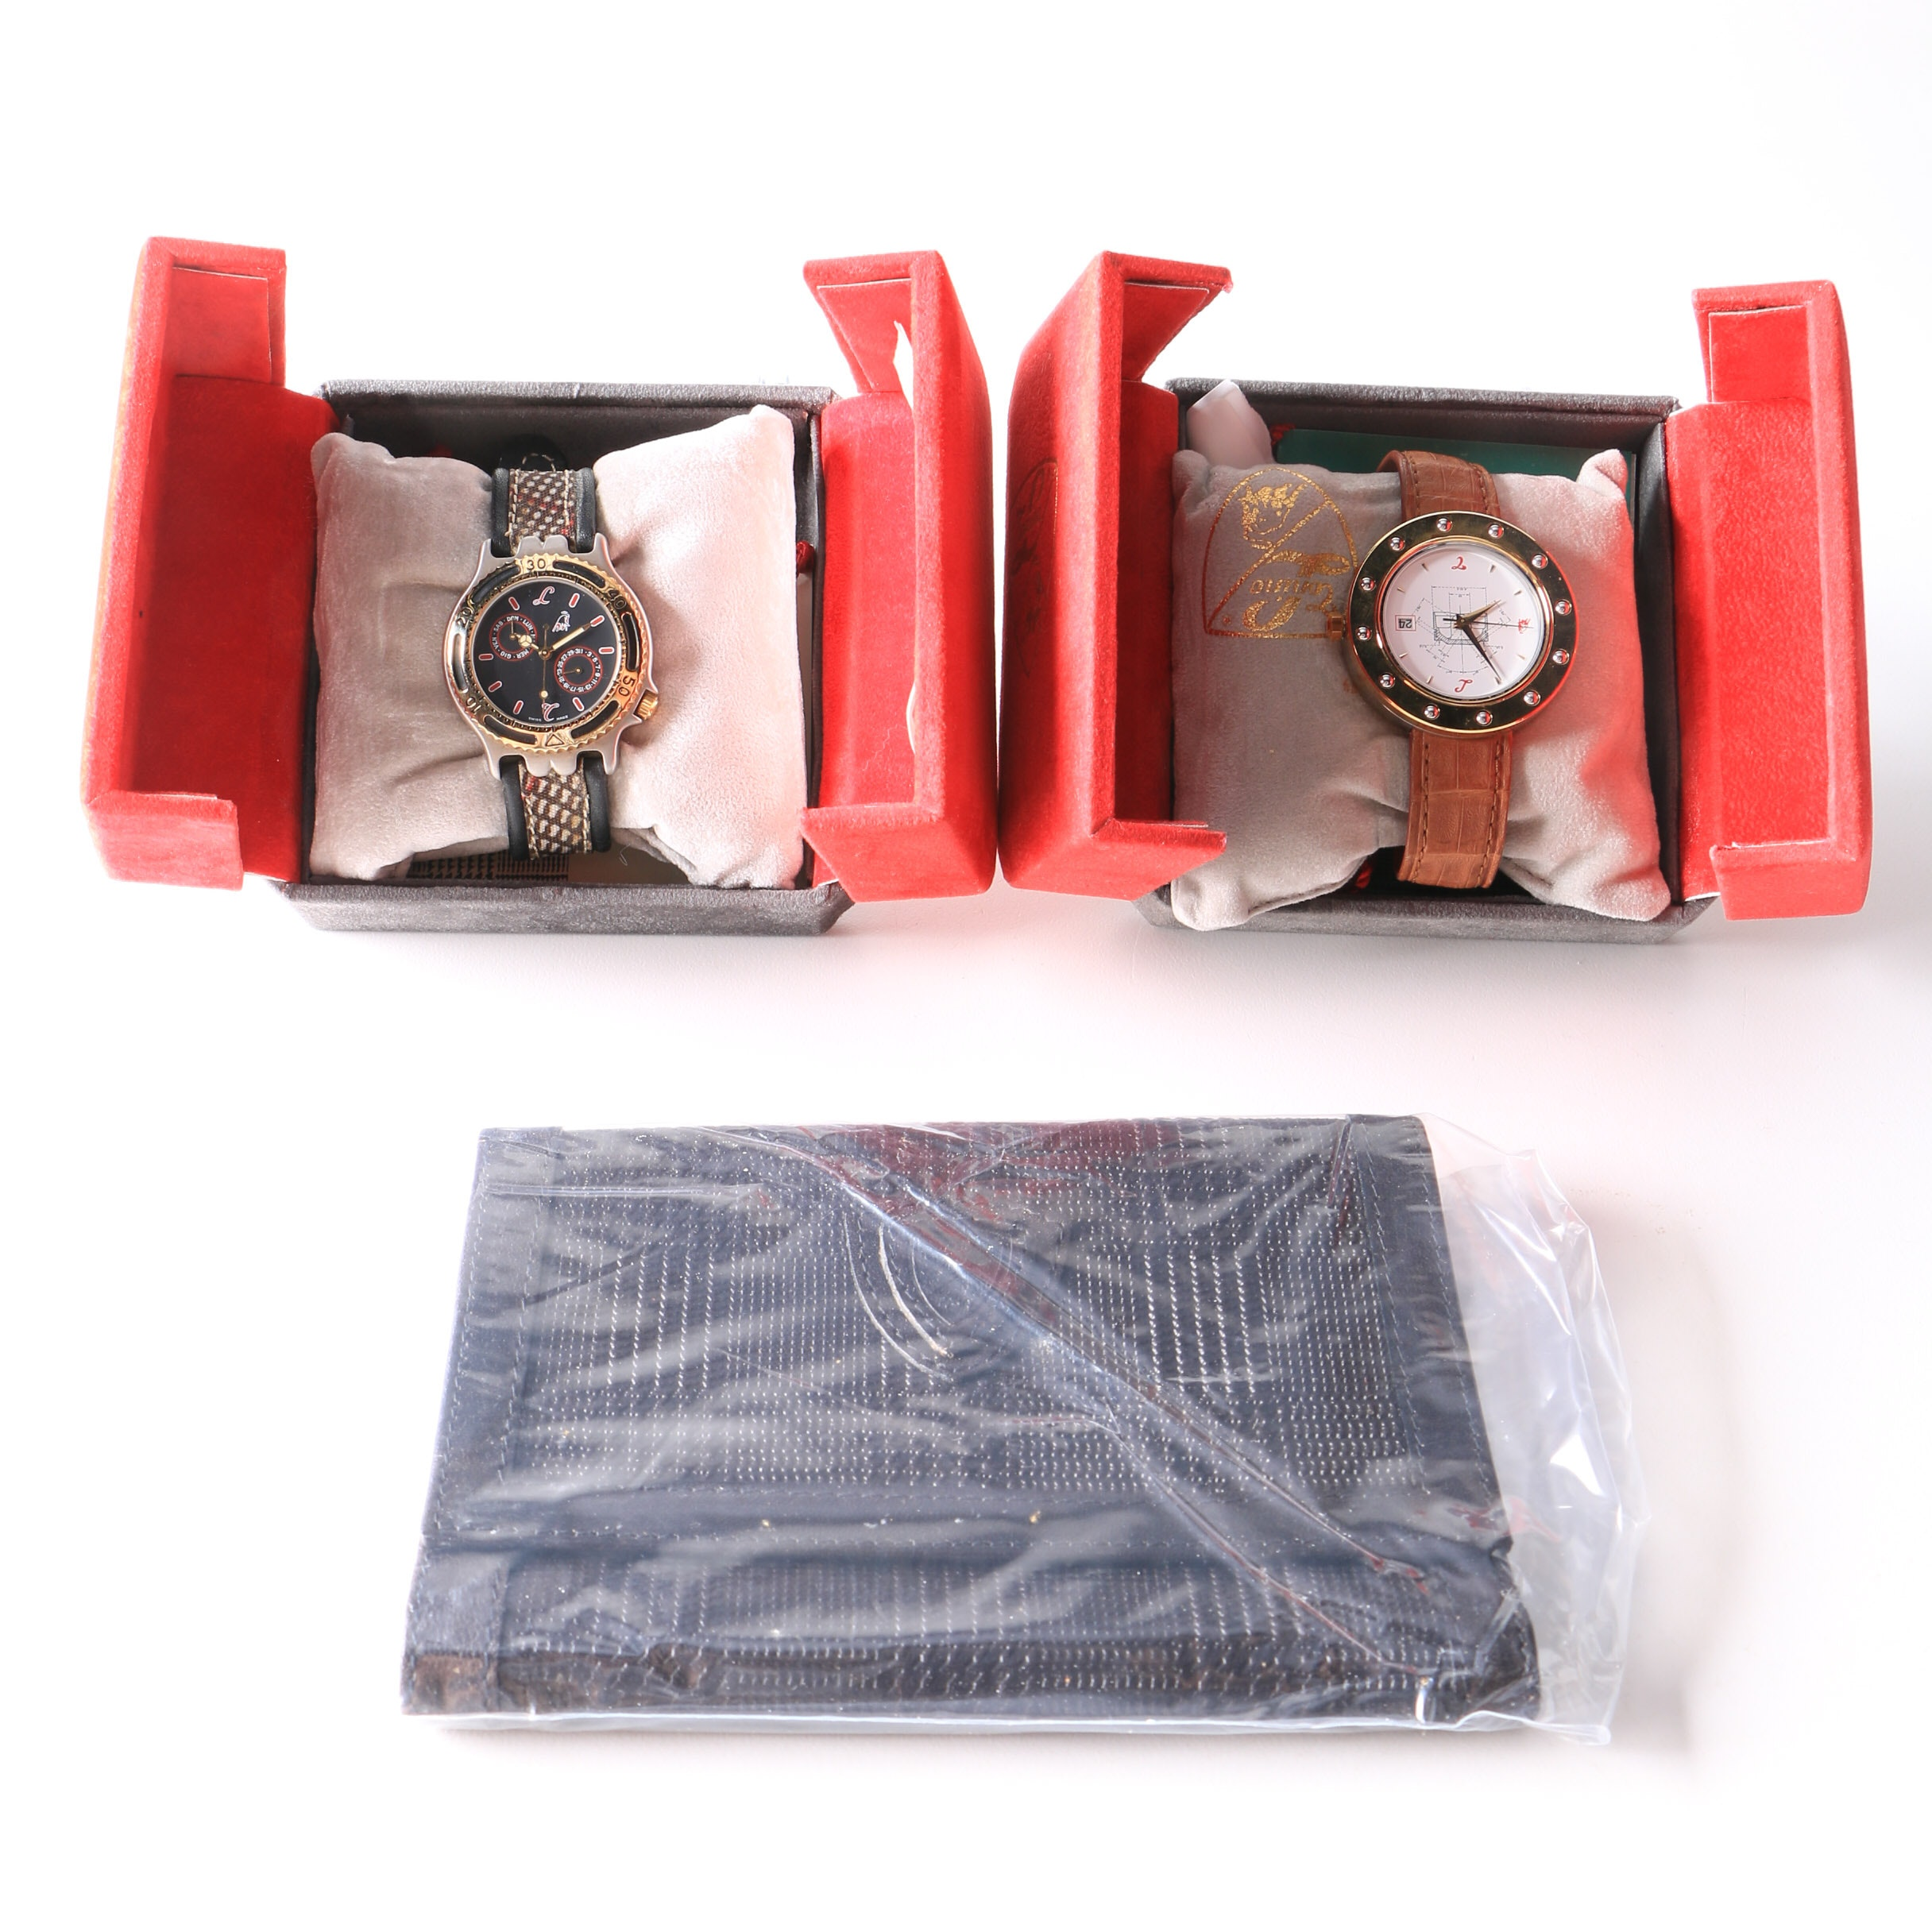 Tonino Lamborghini Wristwatches and Wallet